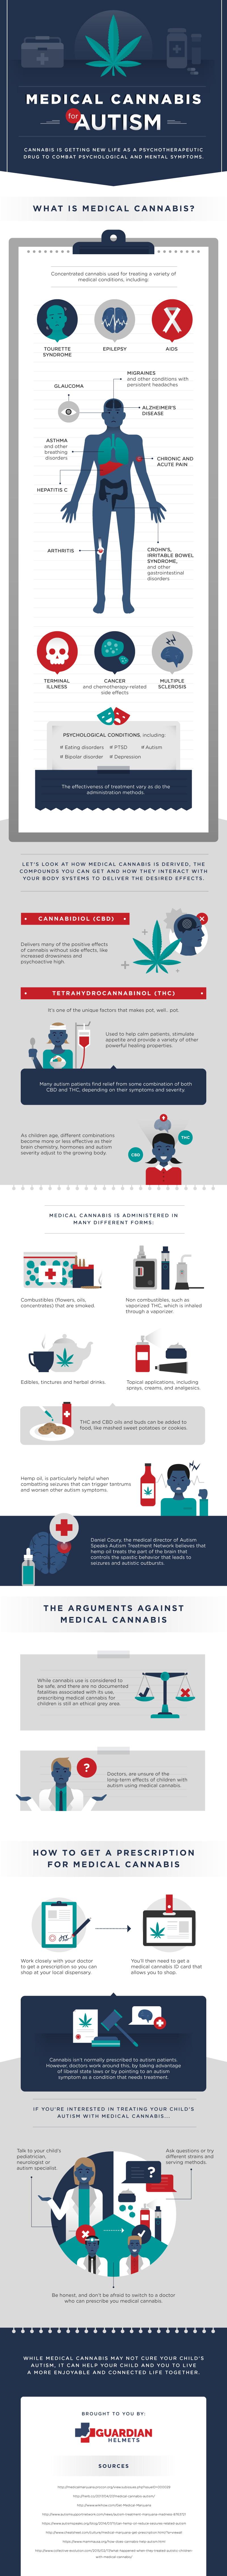 cannabis autism infographic